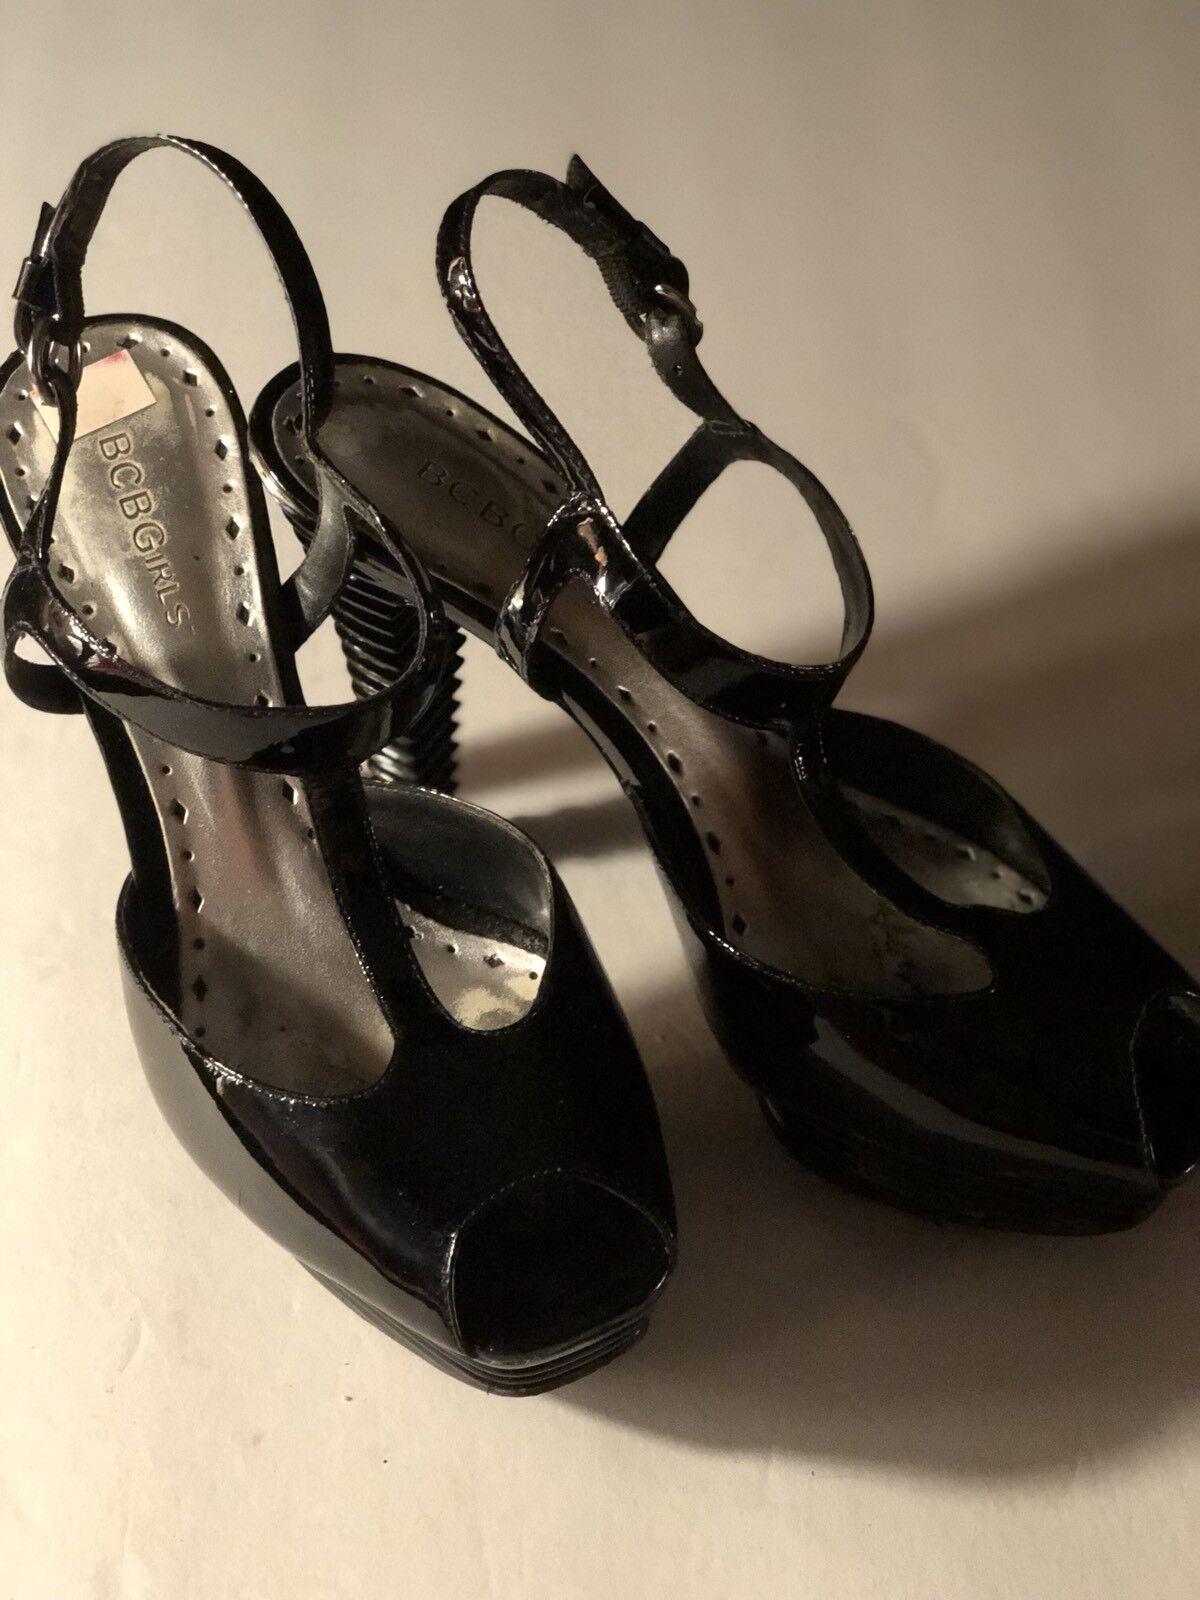 Bcbg Girl Gladiator T Strap Patent Leather Shiny Heels shoes 8.5